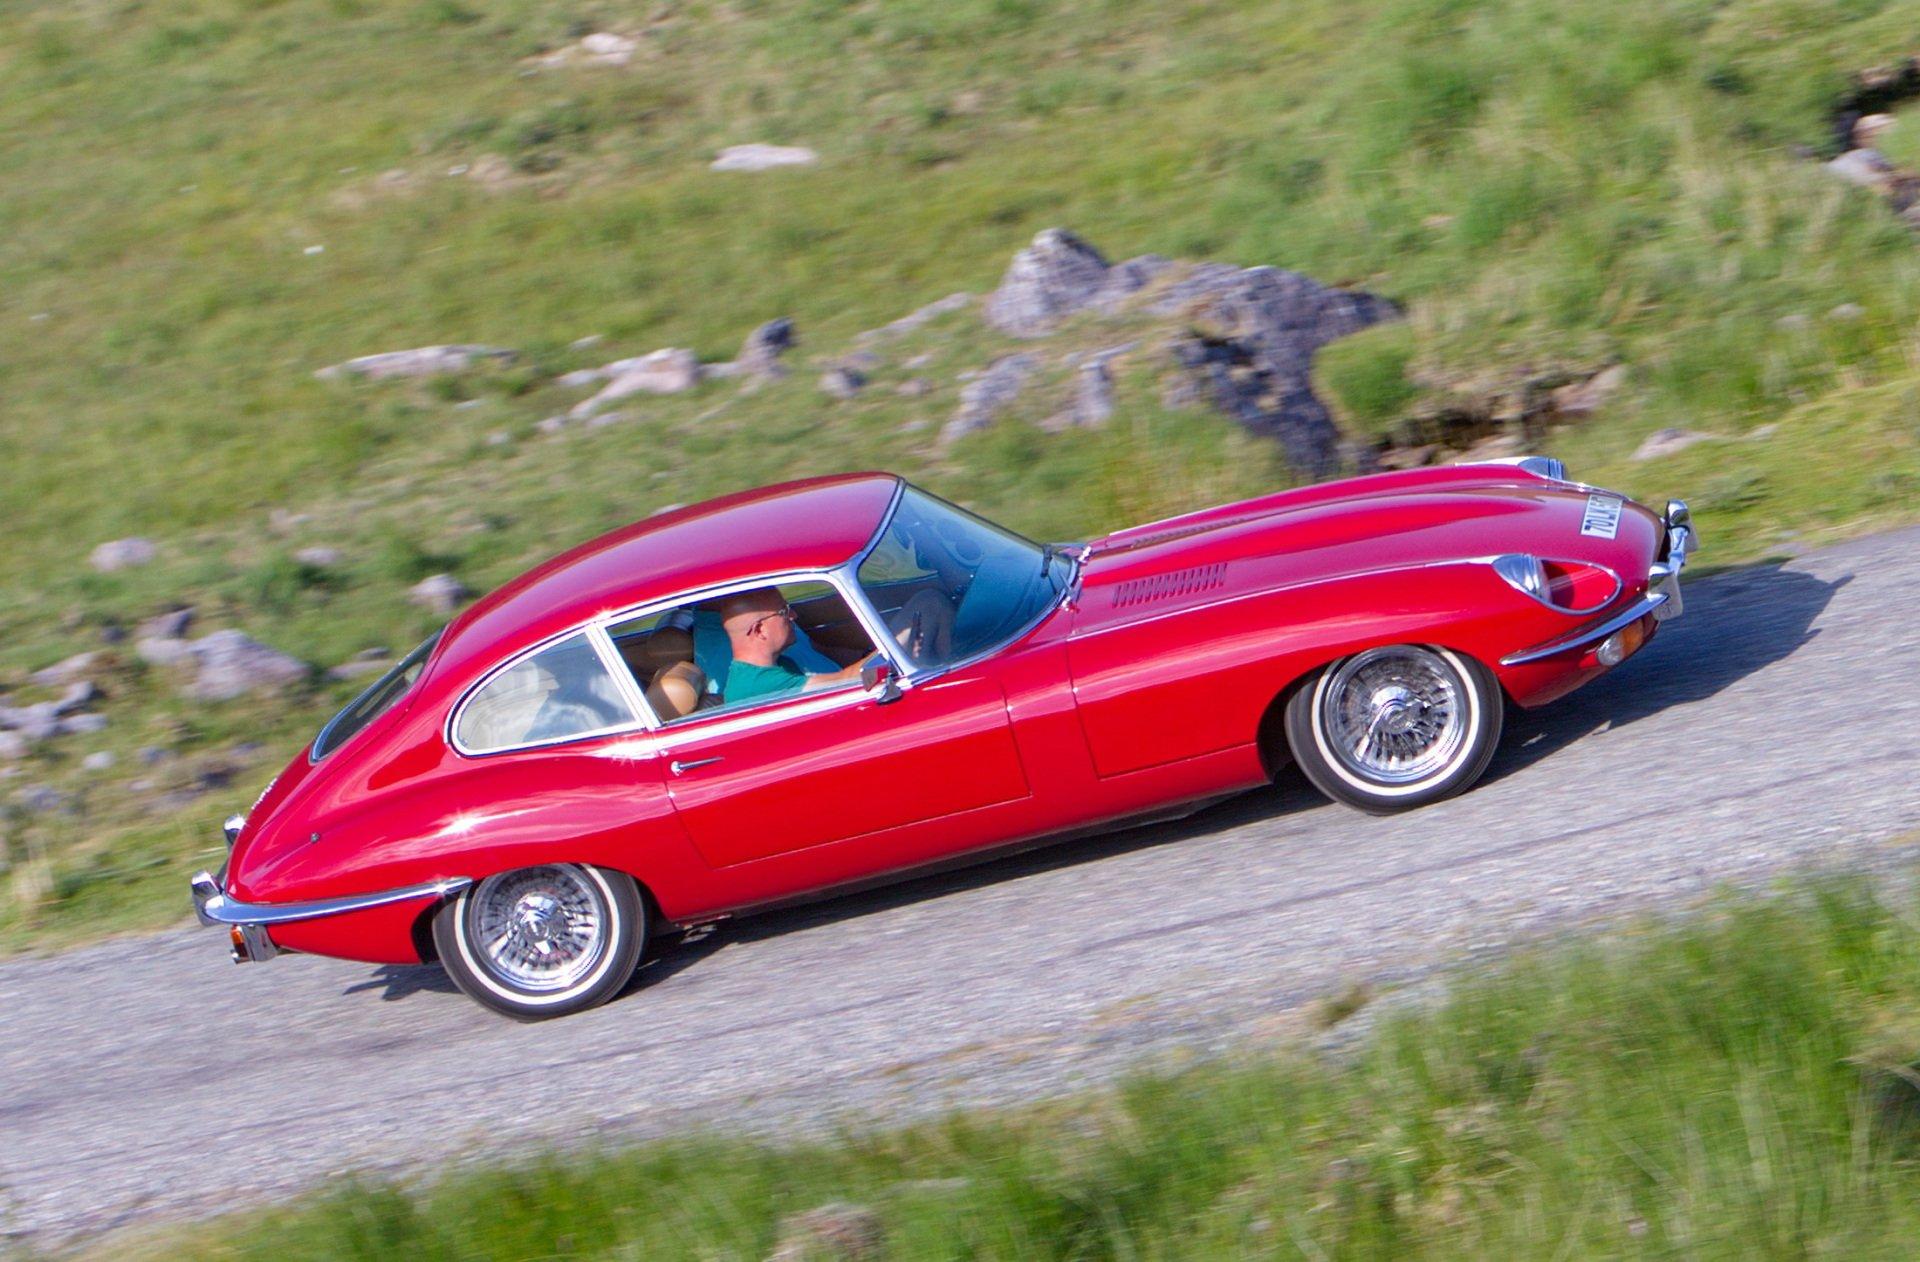 Car Hire Ireland: Motorcycle & Classic Car Rental